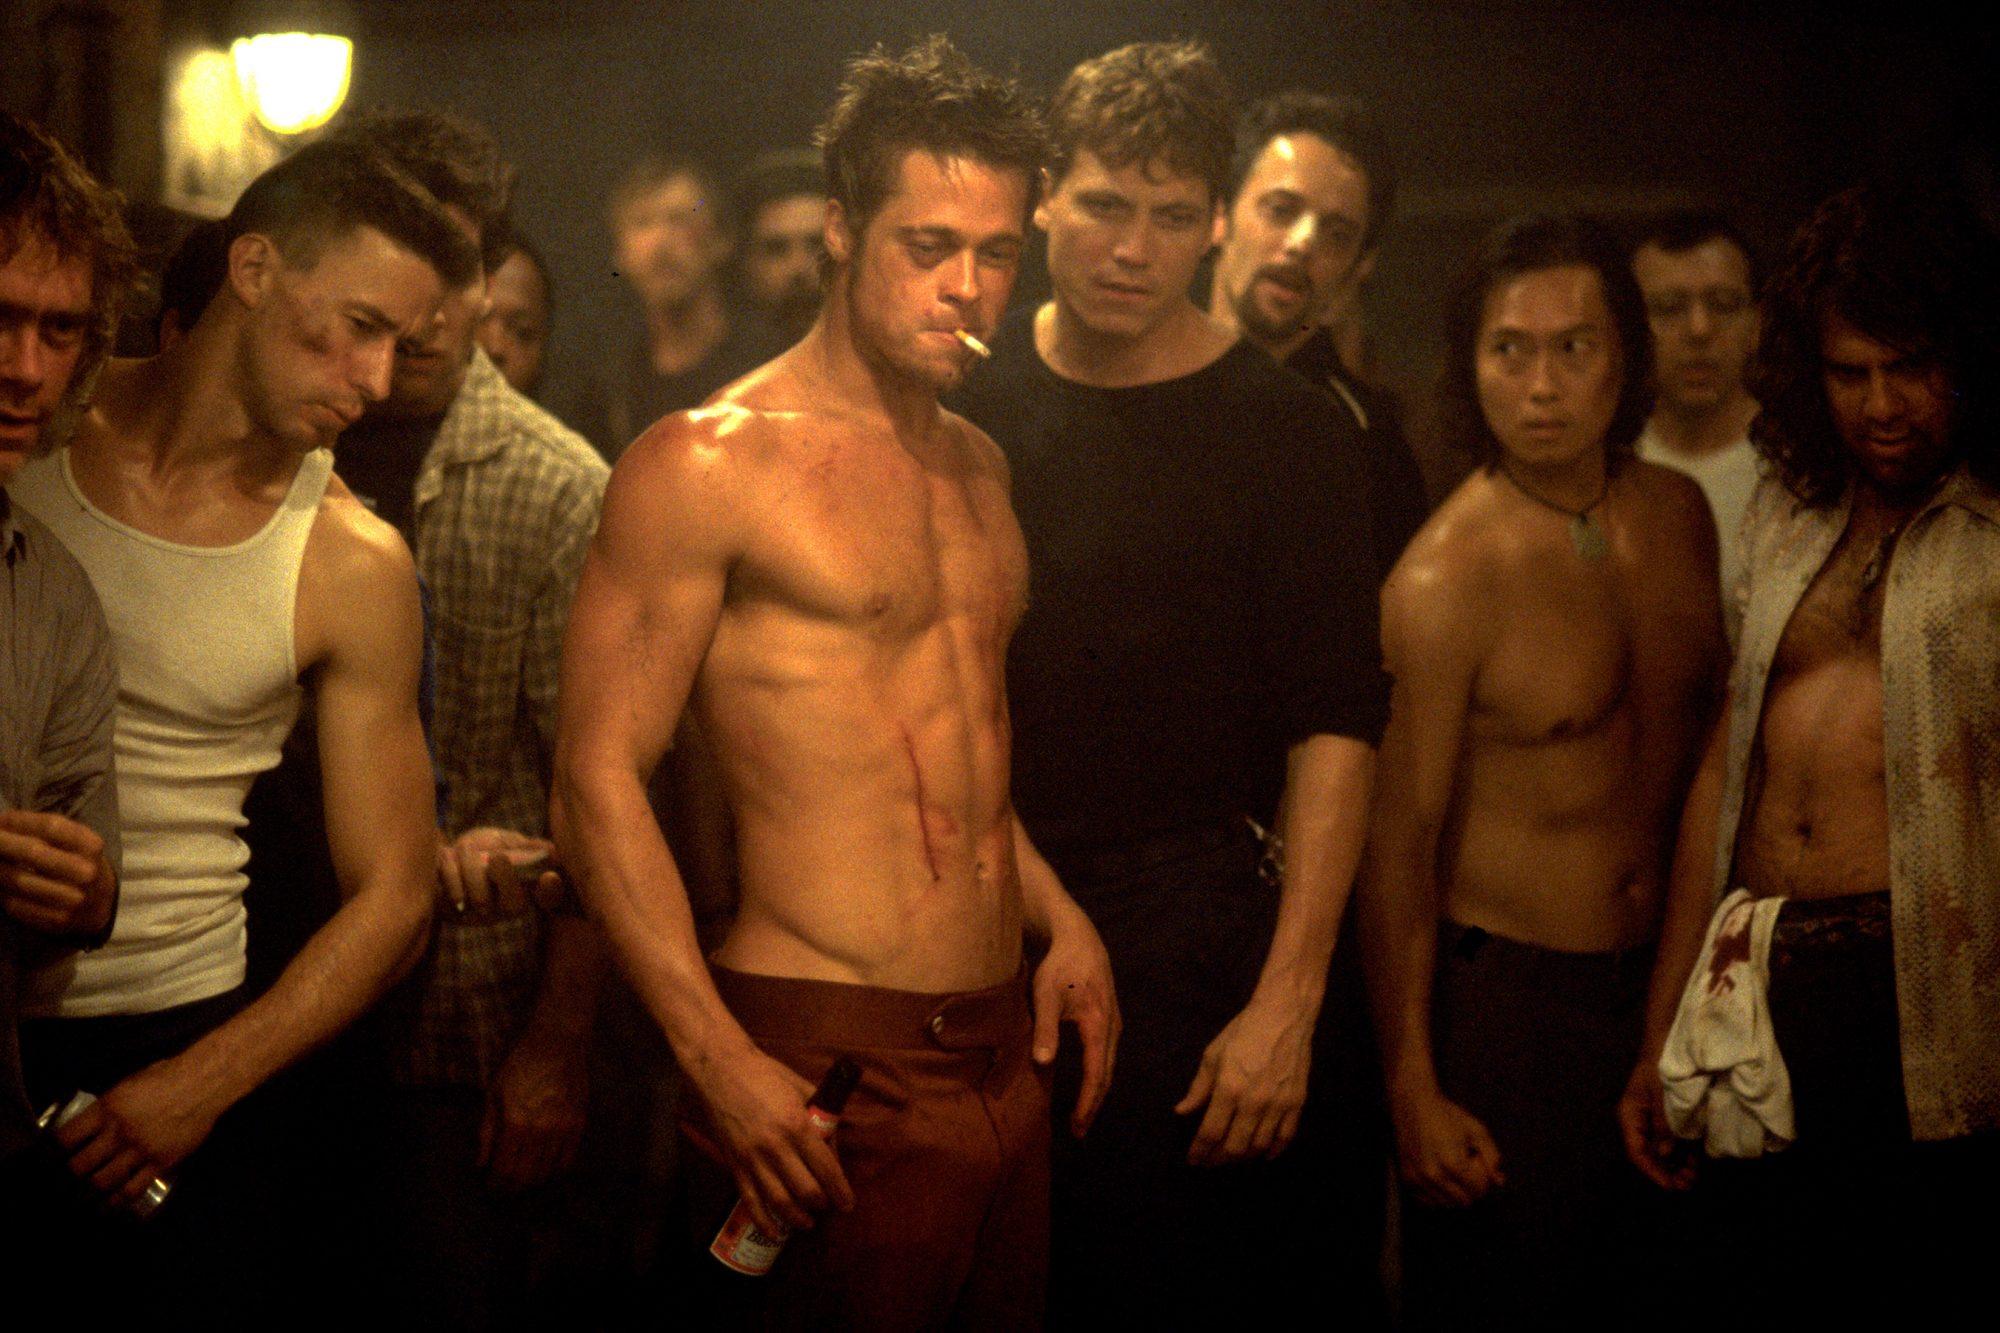 FIGHT CLUB (1999)Brad PittMerrick MortonFox